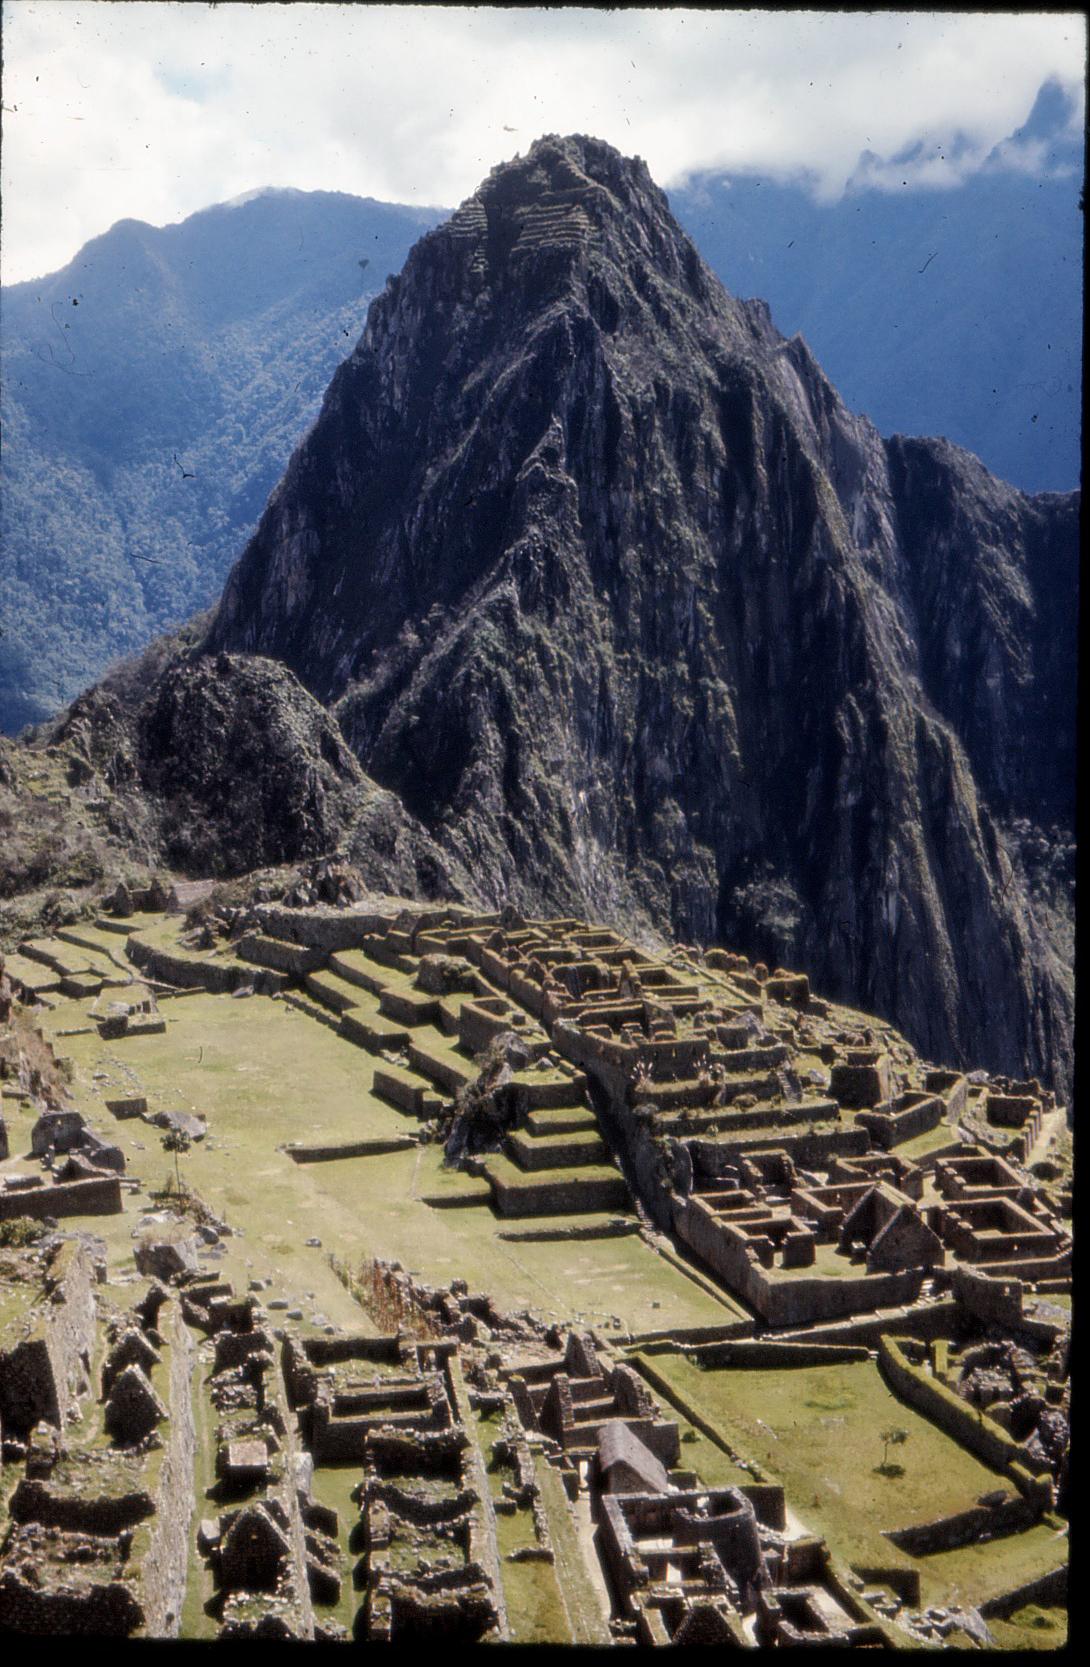 southamerica1972-18